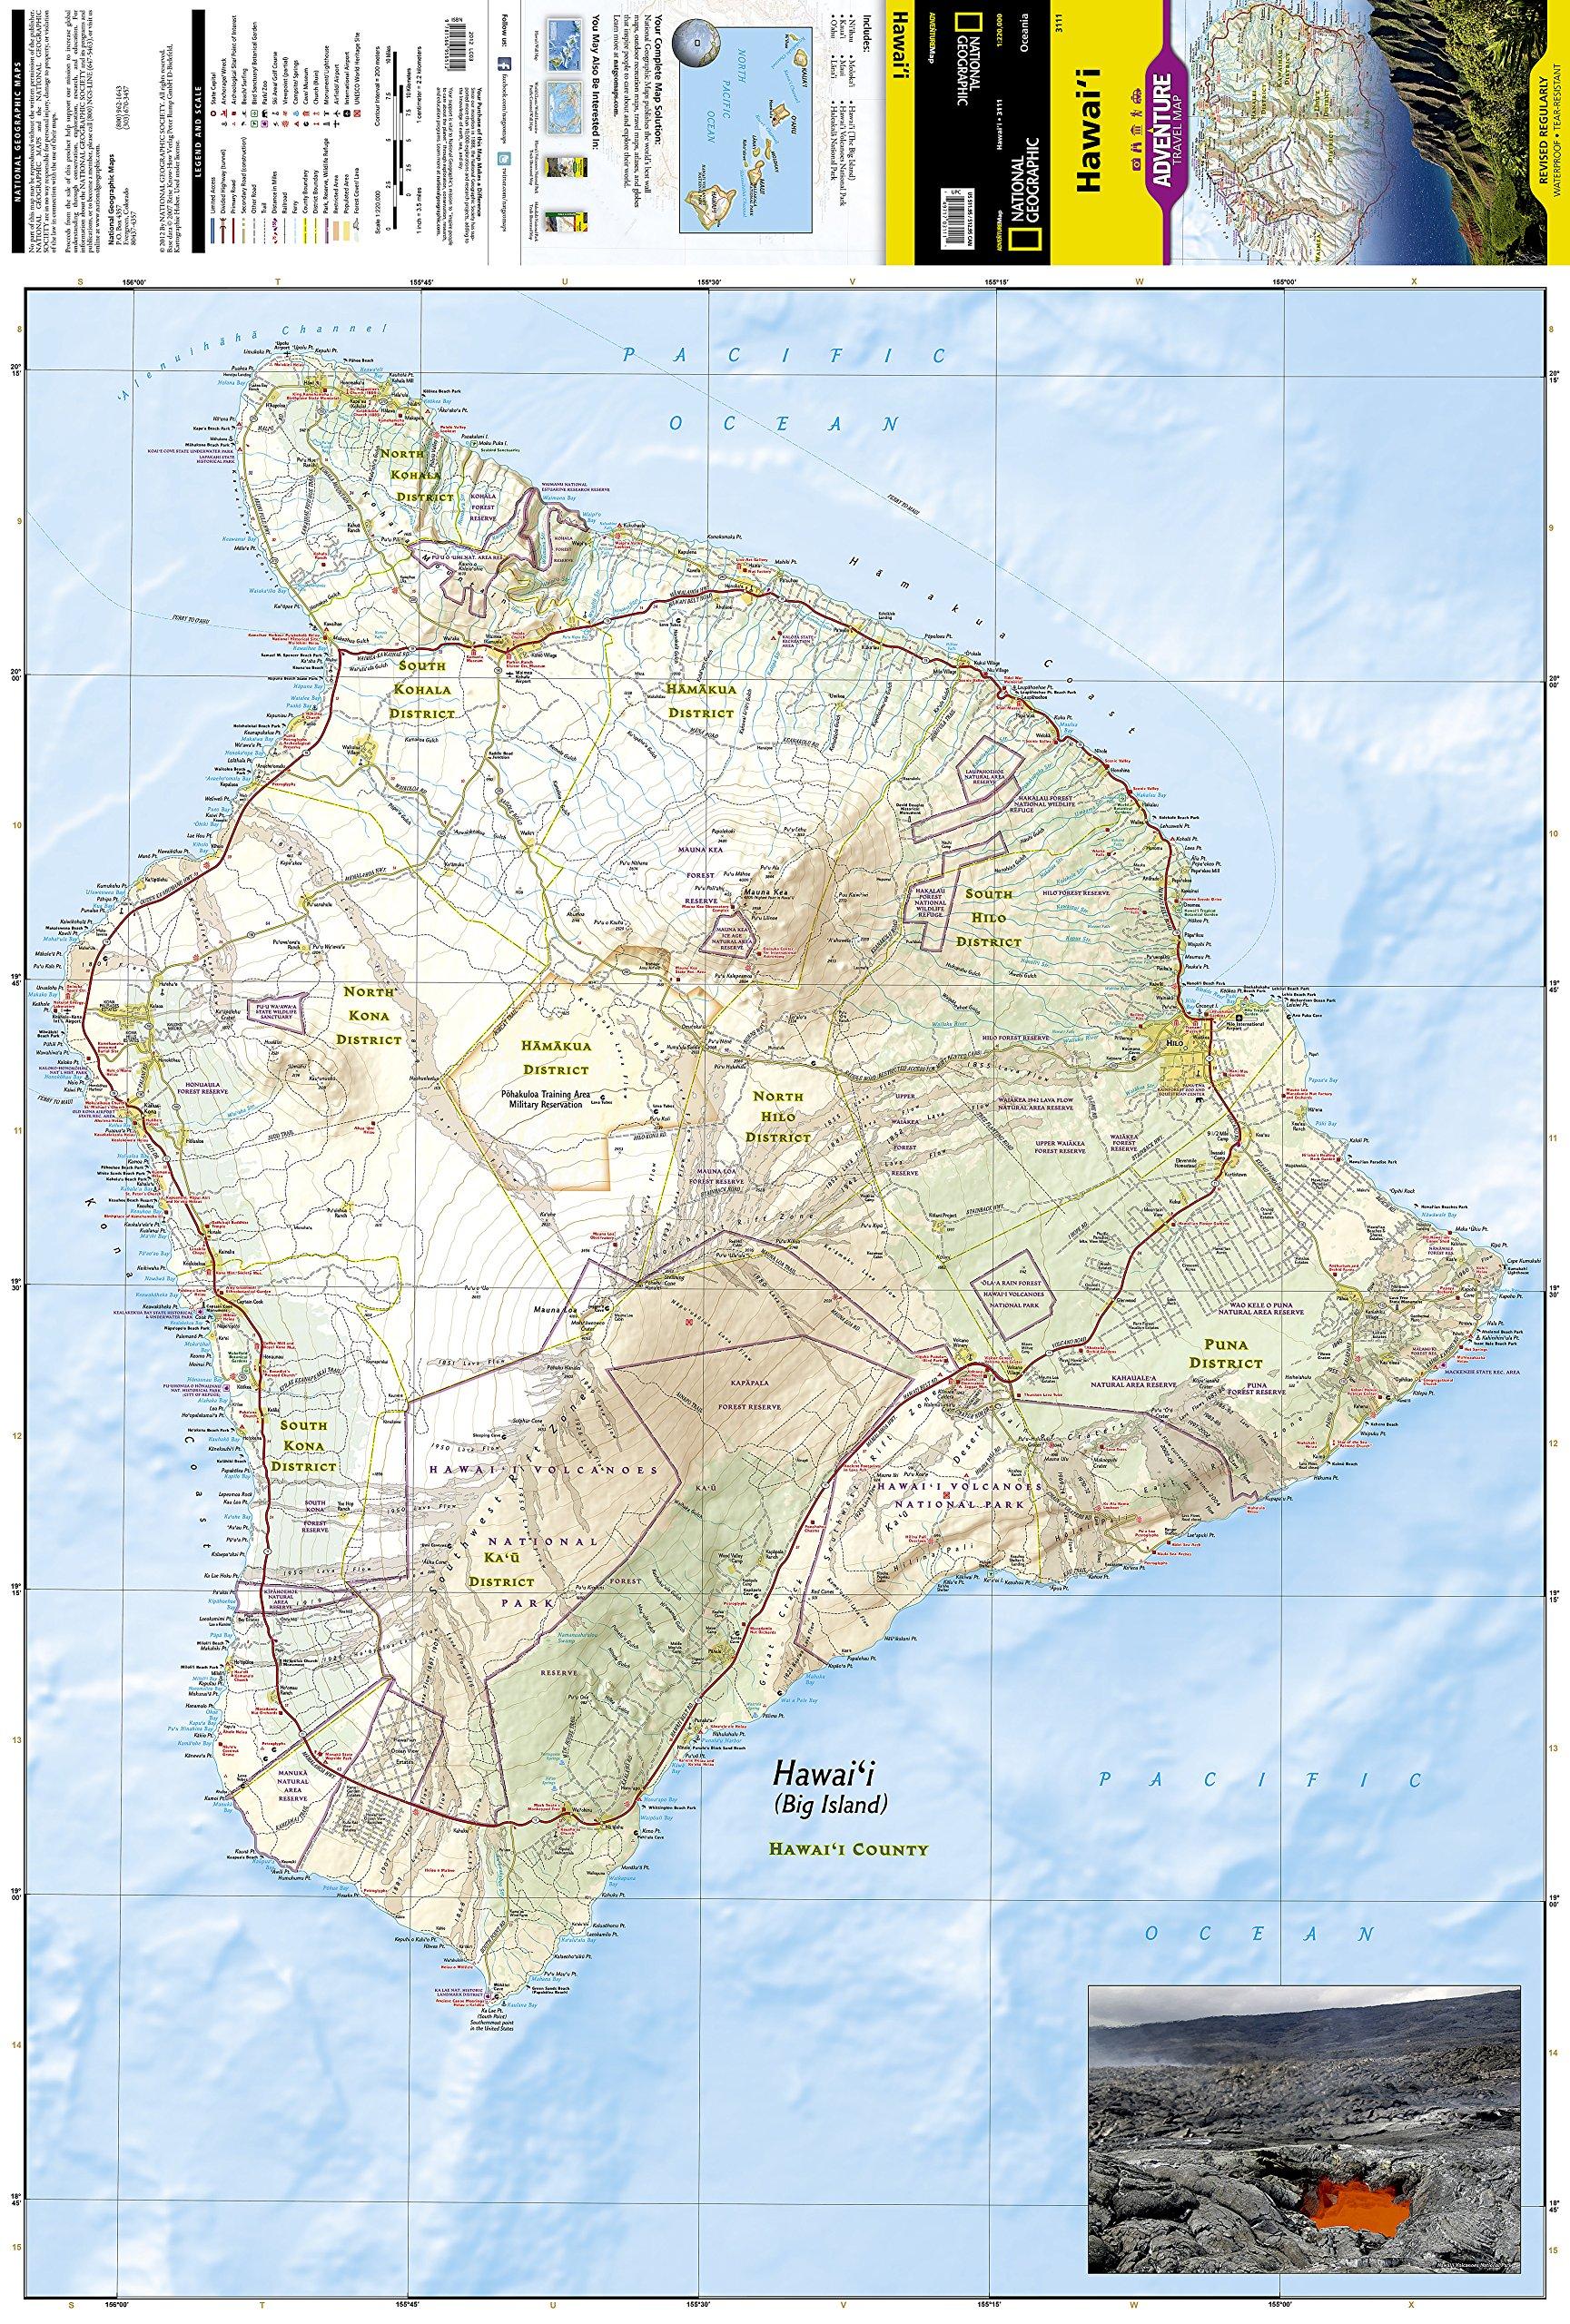 Hawaii : Travel Maps International Adventure Map: Amazon.co.uk ...